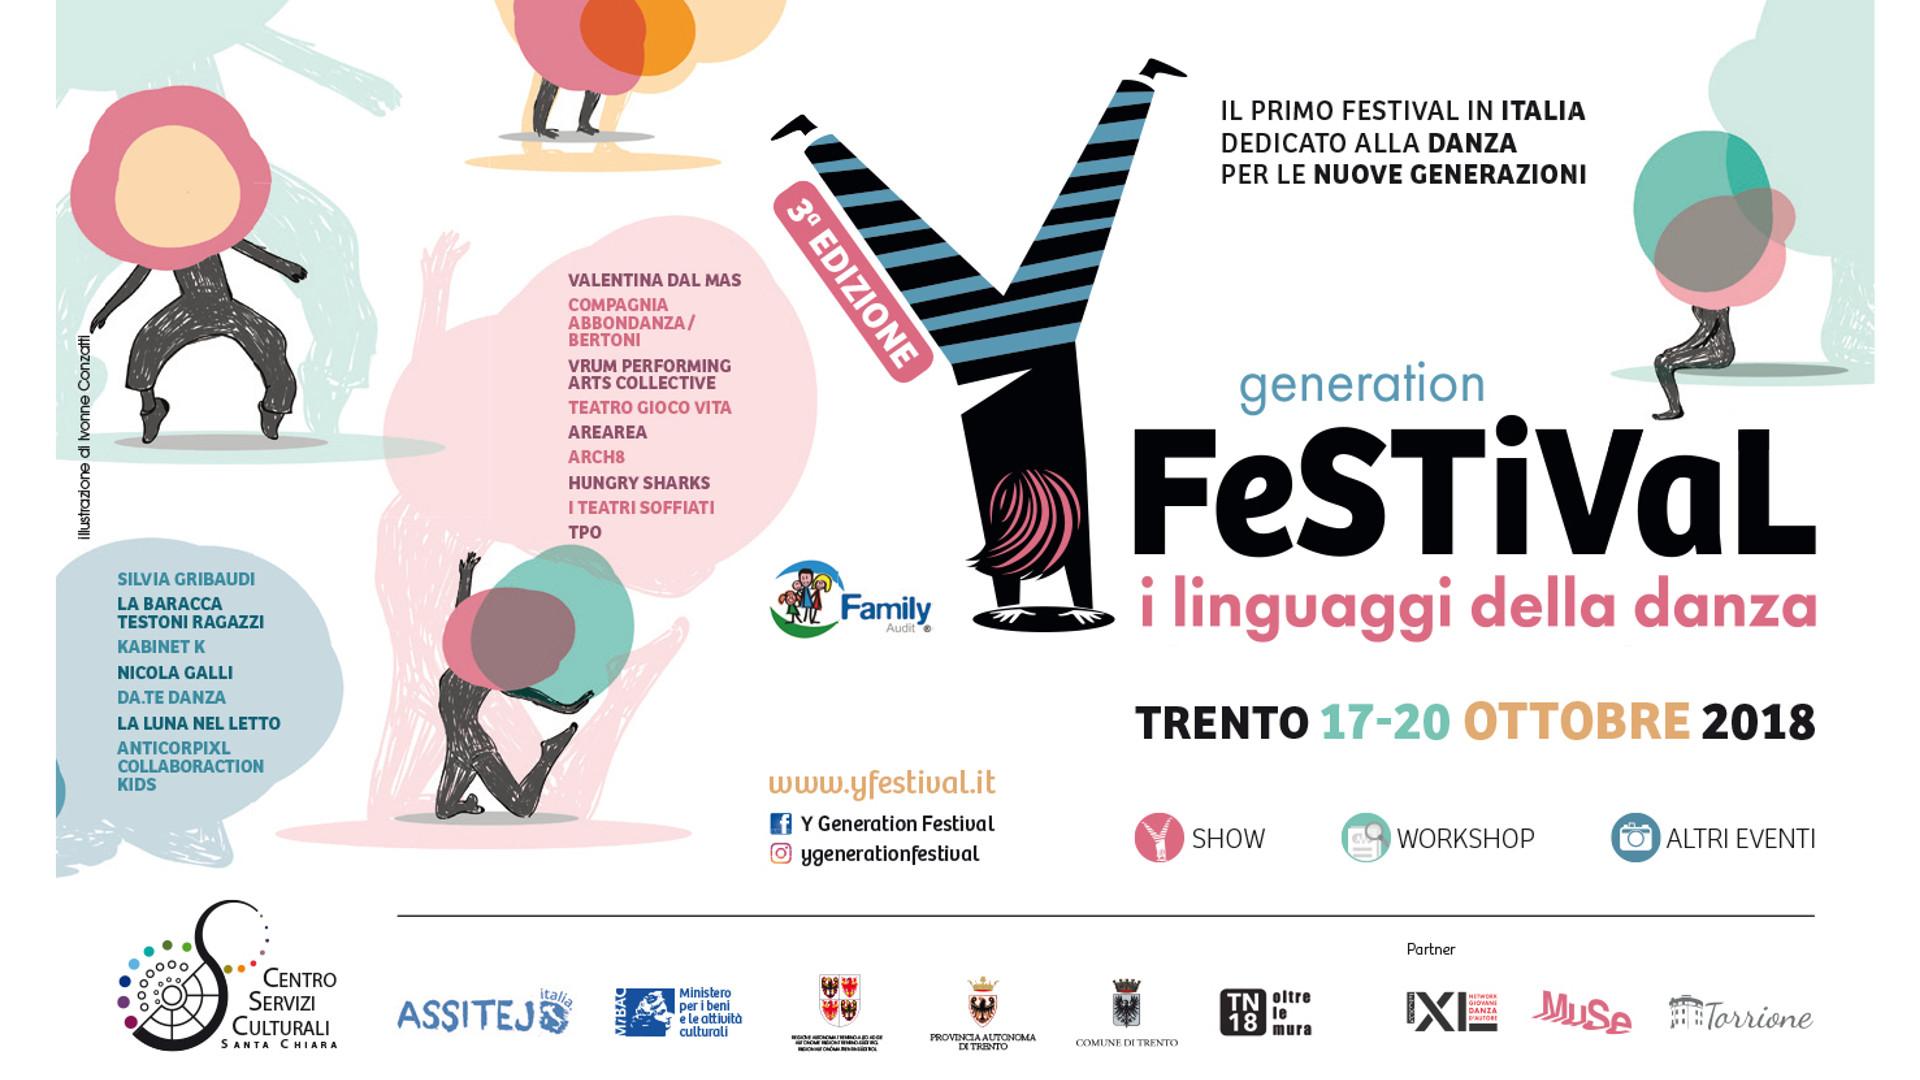 Yfestival Trento 2018